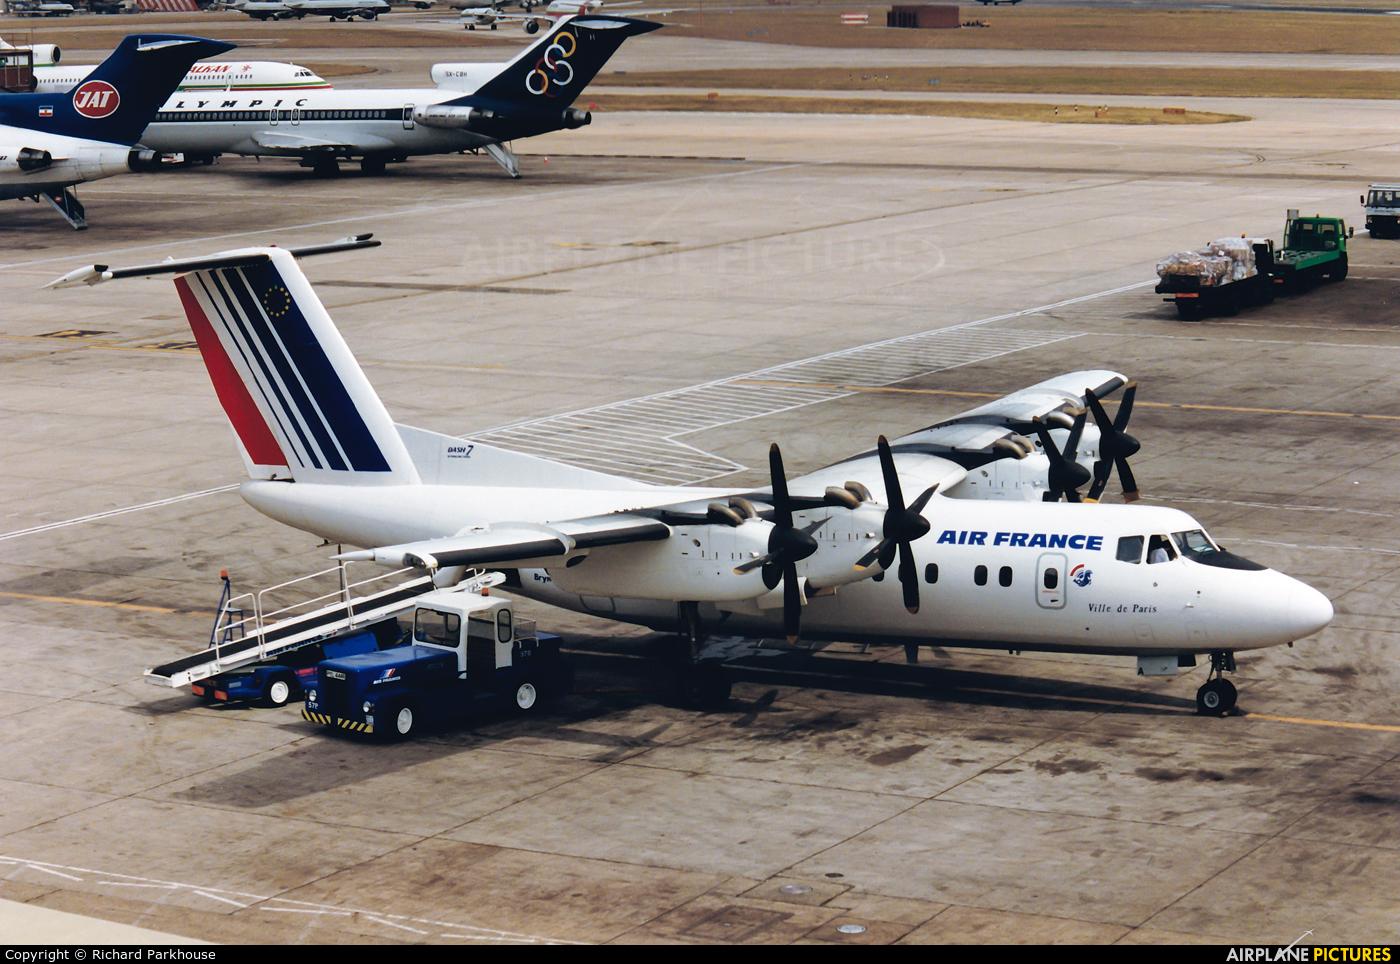 Air France G-BRYA aircraft at London - Heathrow